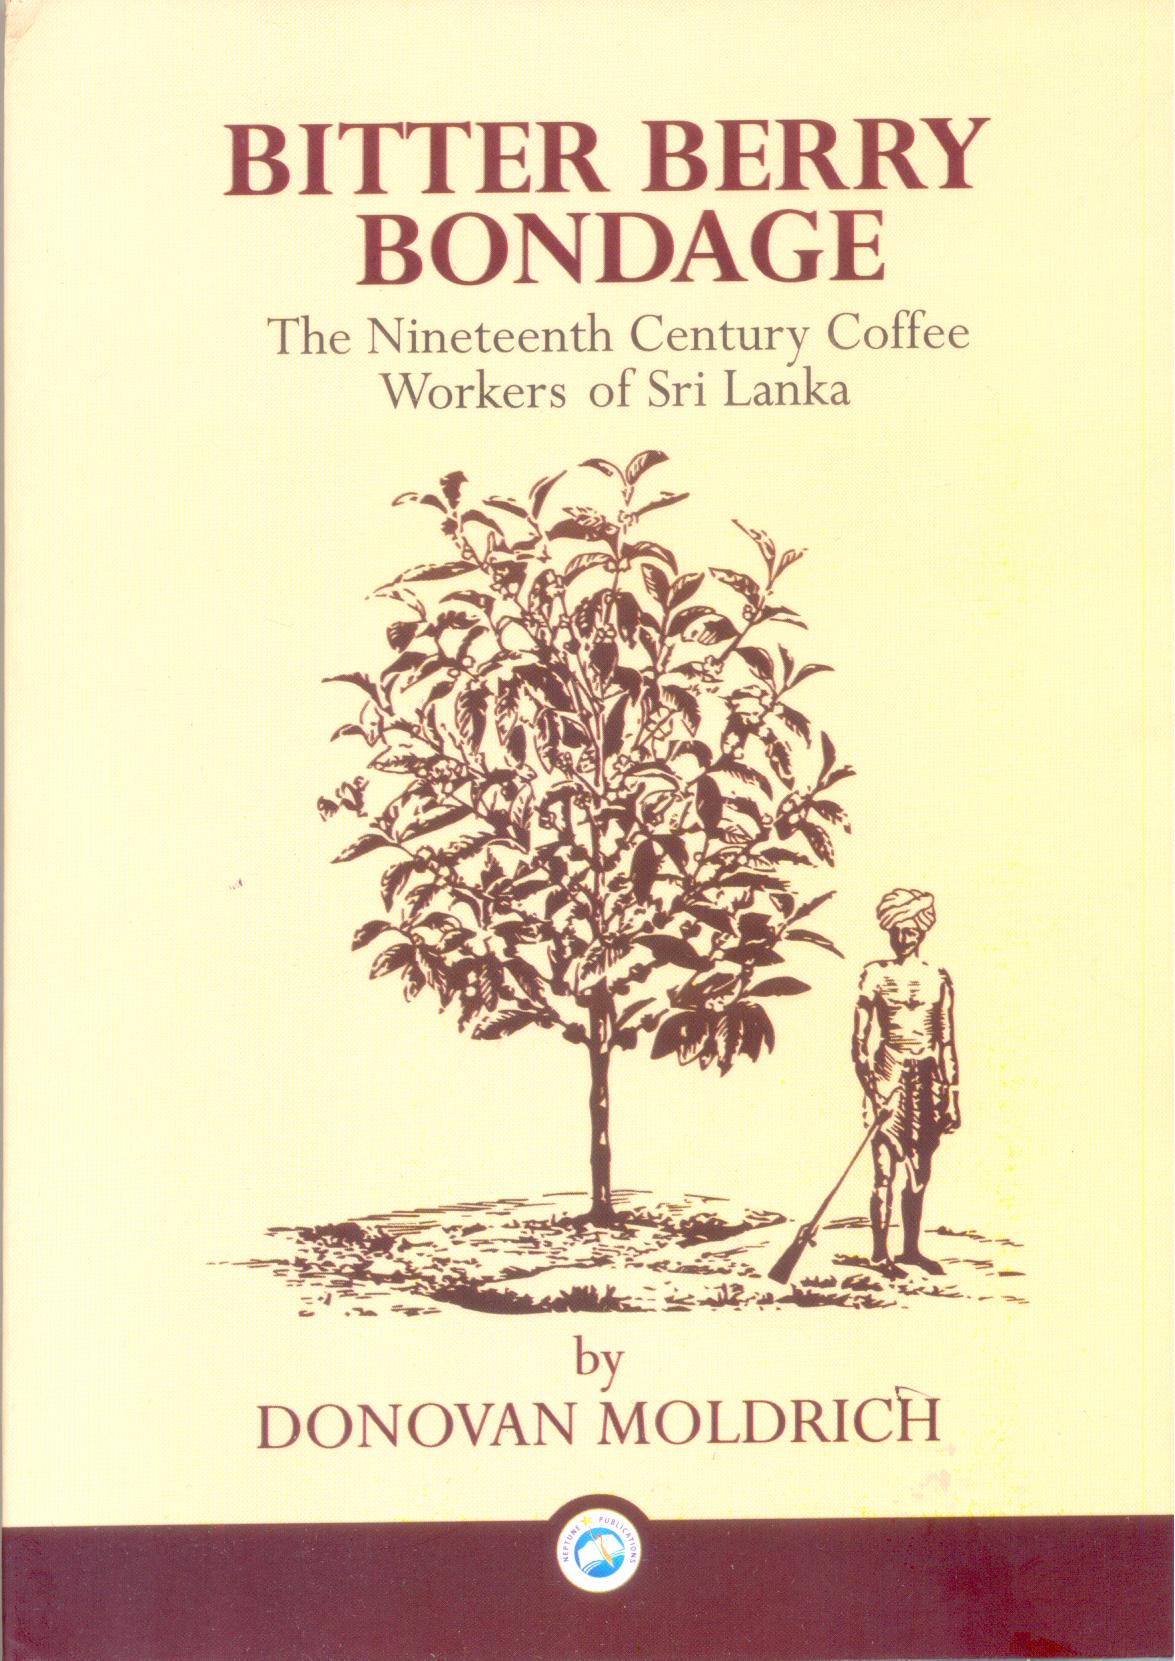 Bitter Berry Bondage : The Nineteenth Century Coffee Workers of Sri Lanka